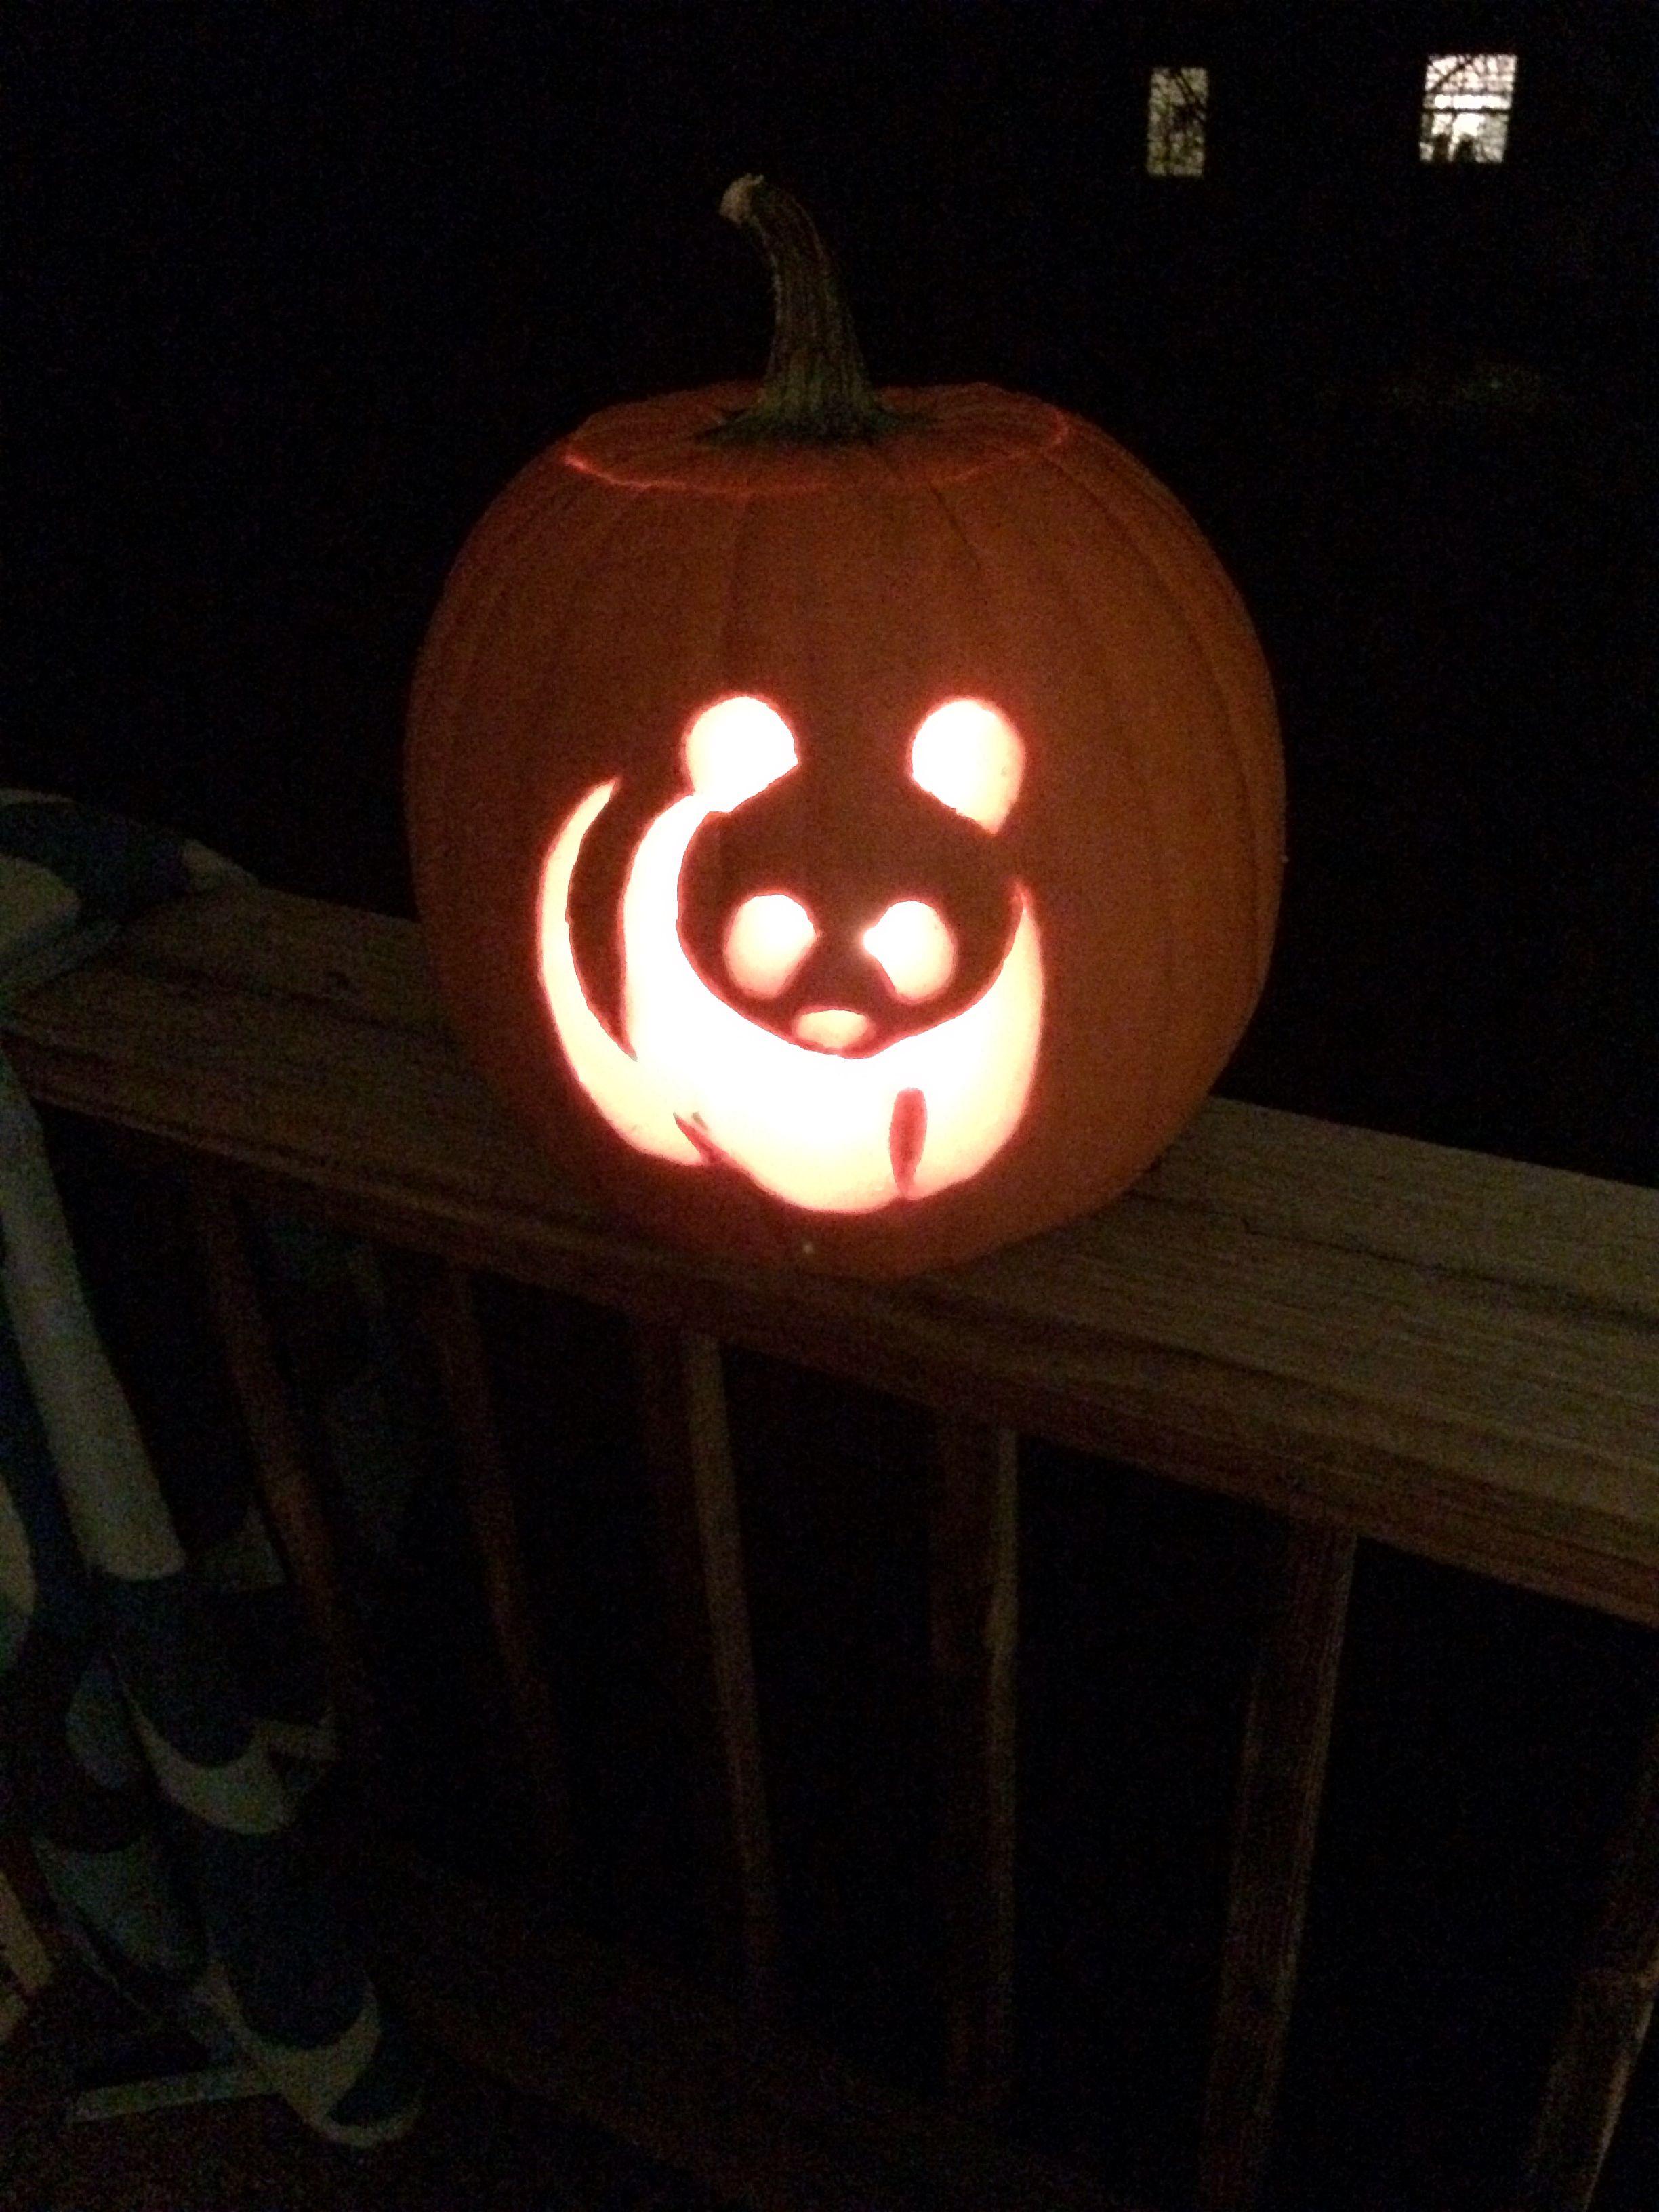 pumpkin carving! wwf pandas artsy stuff! pumpkin carving